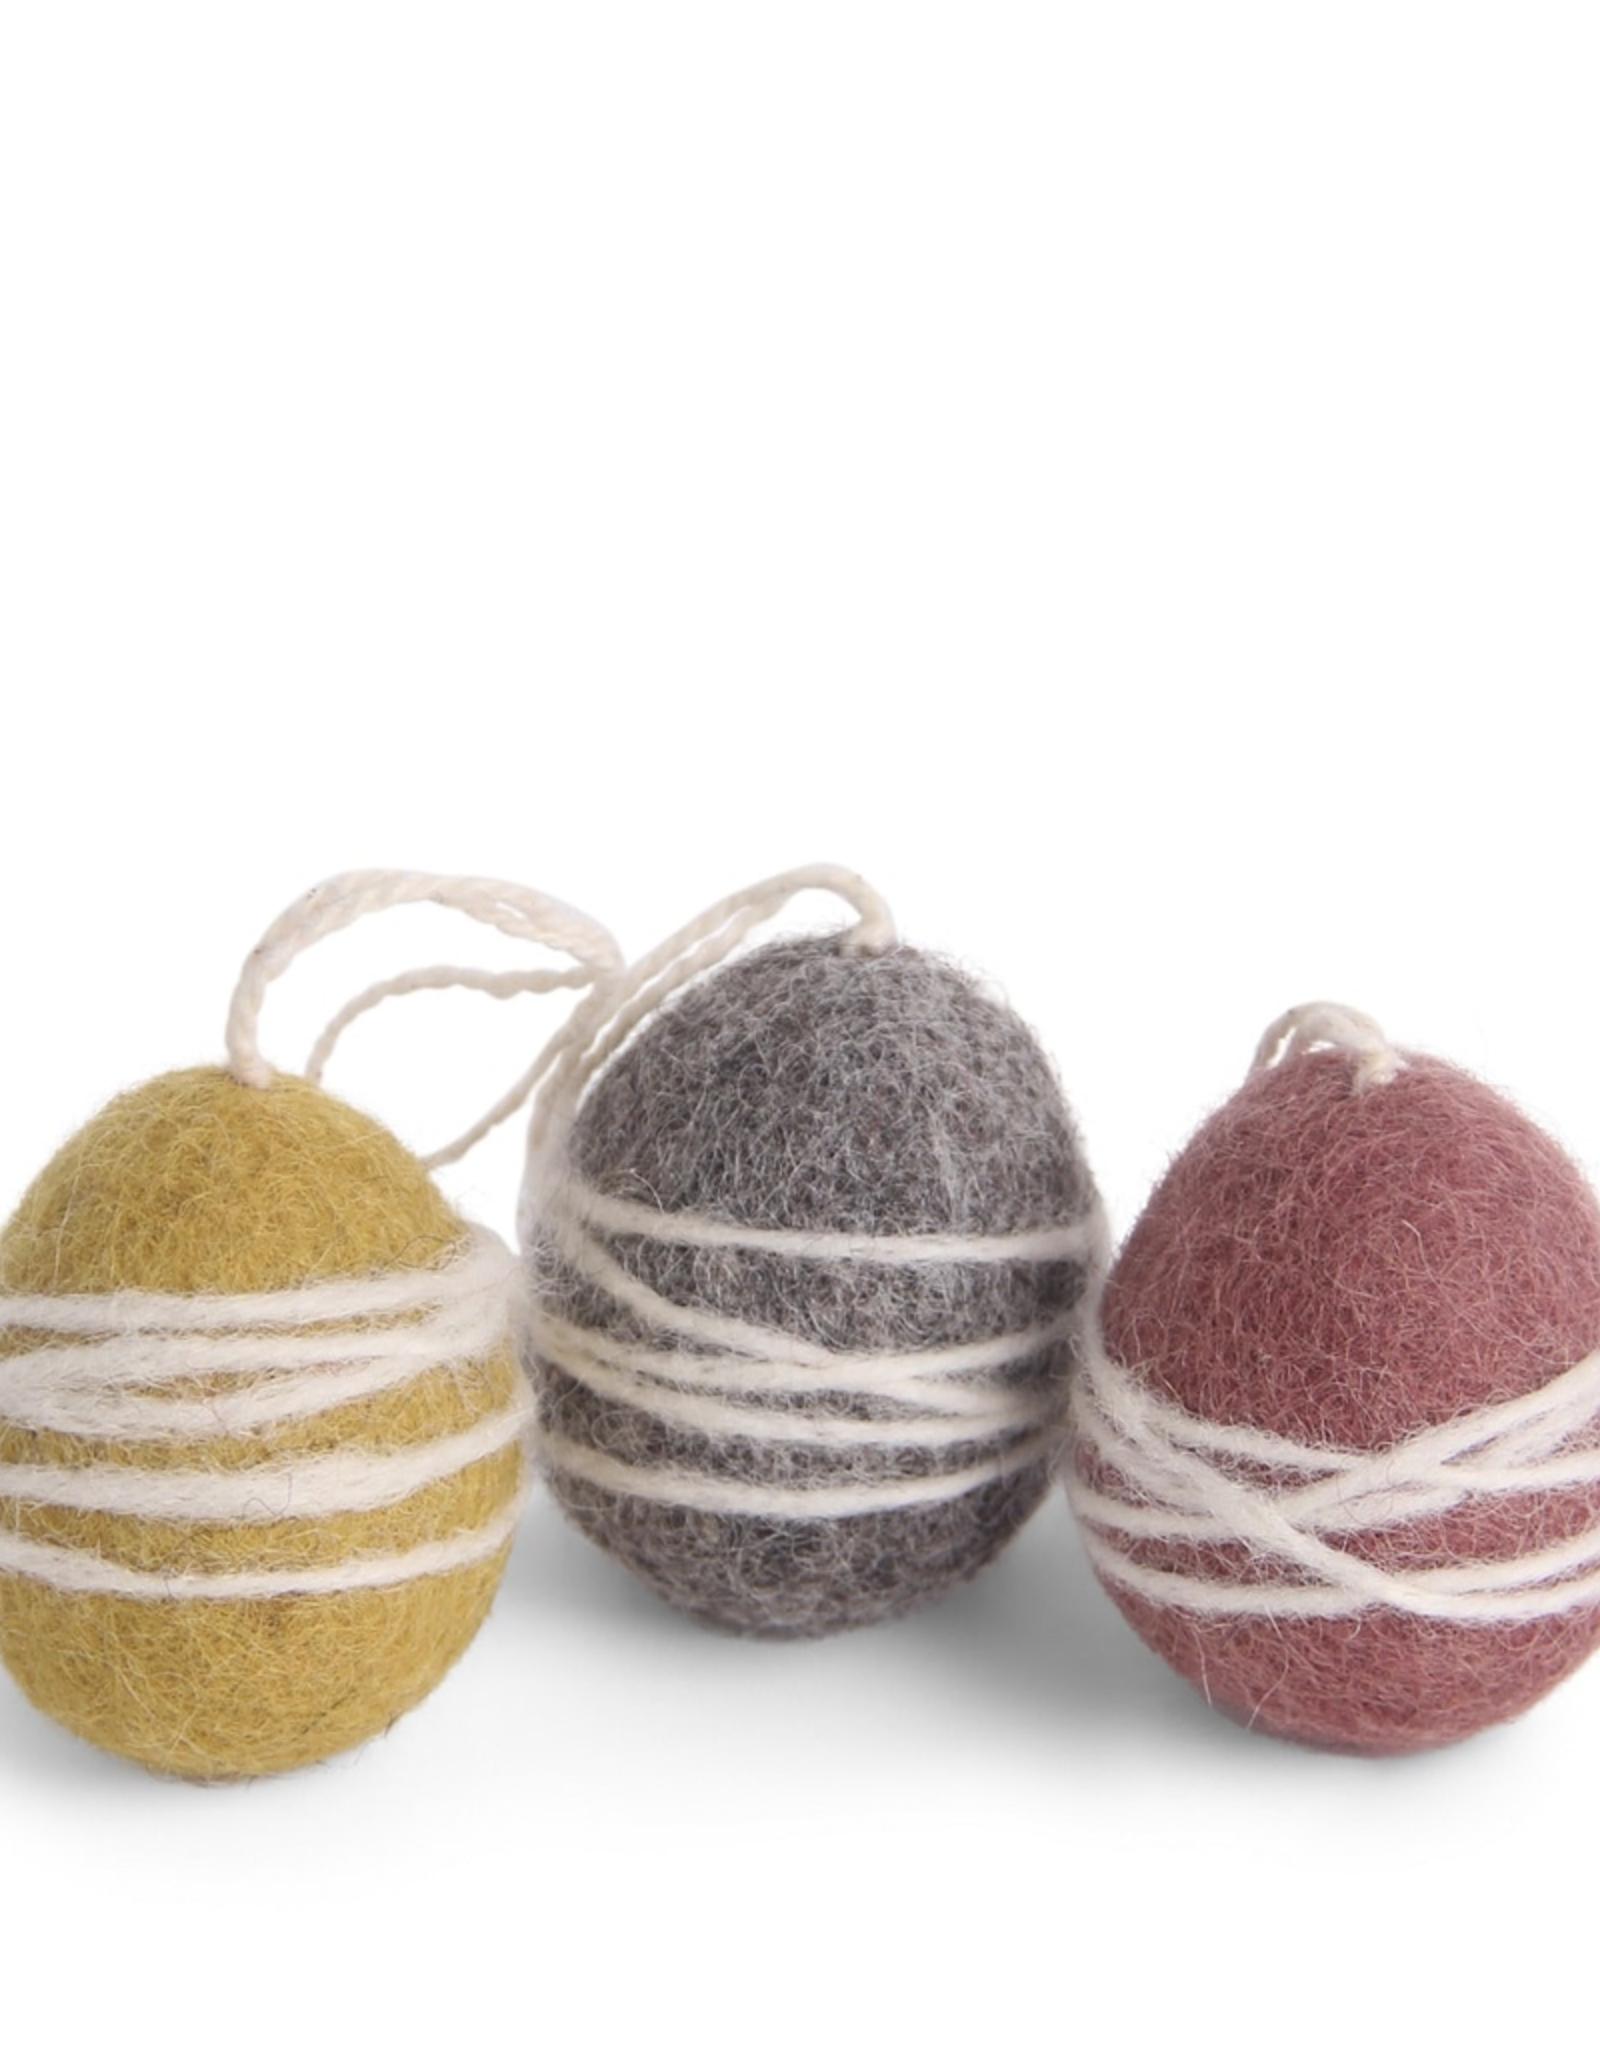 Felted Egg Ornaments Set/3, Fair Trade